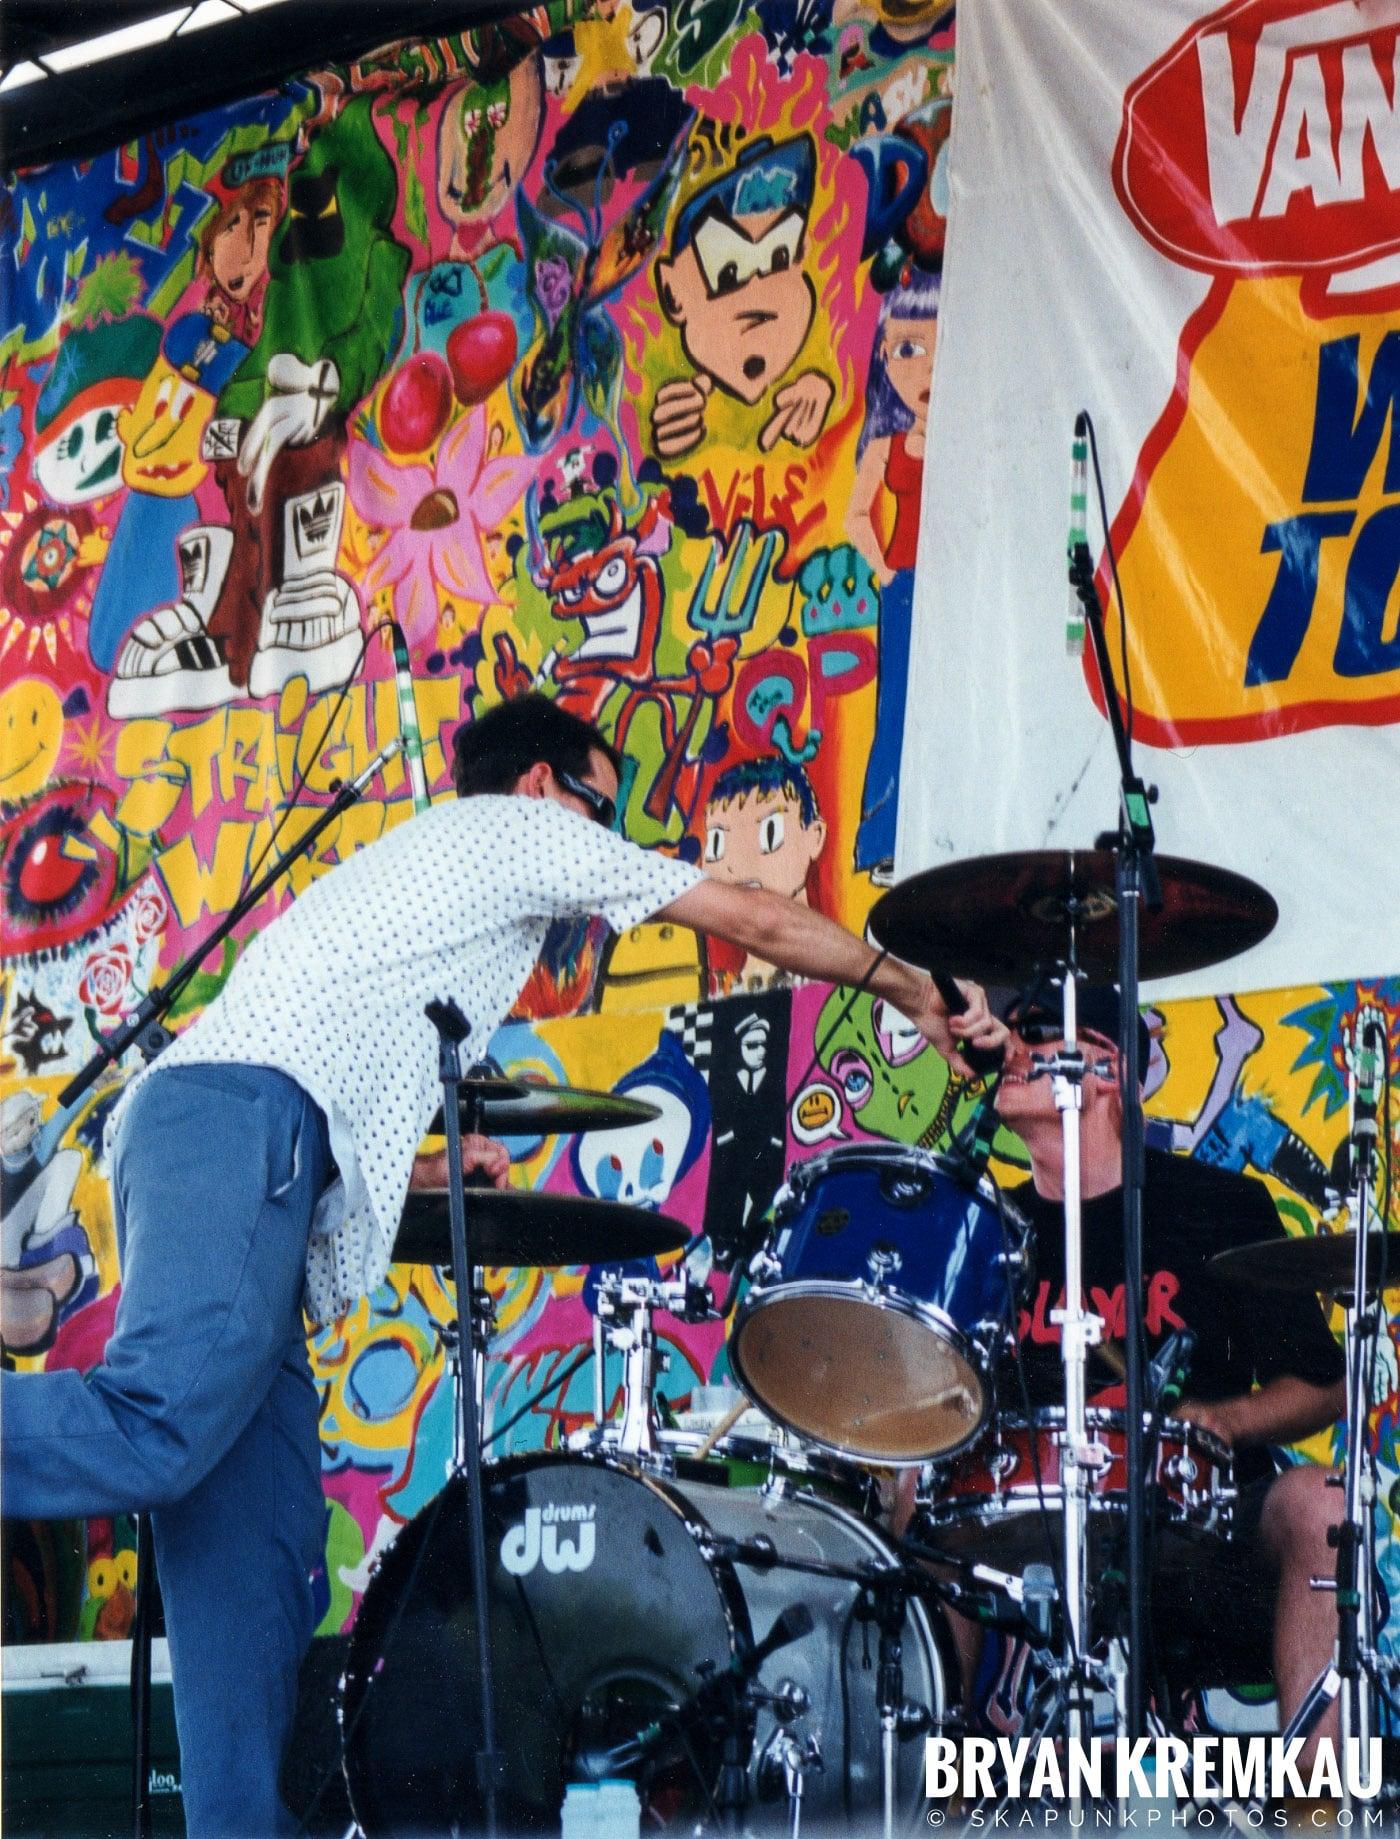 The Vandals @ Vans Warped Tour, Randall's Island, NYC - 7.16.99 (6)